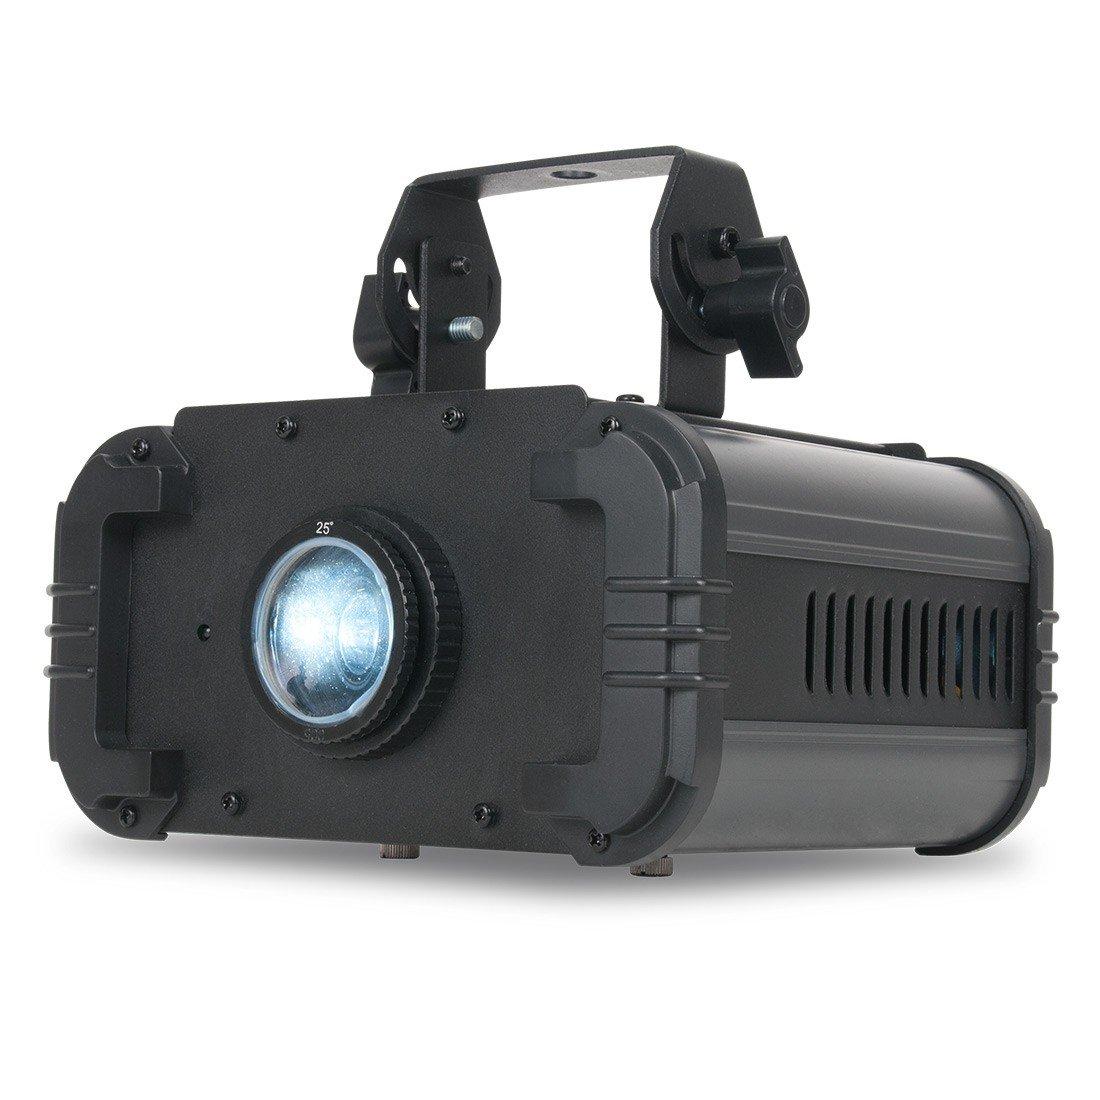 ADJ Products IKON IR 80W WH LED, INCLUDE IR REMOTE